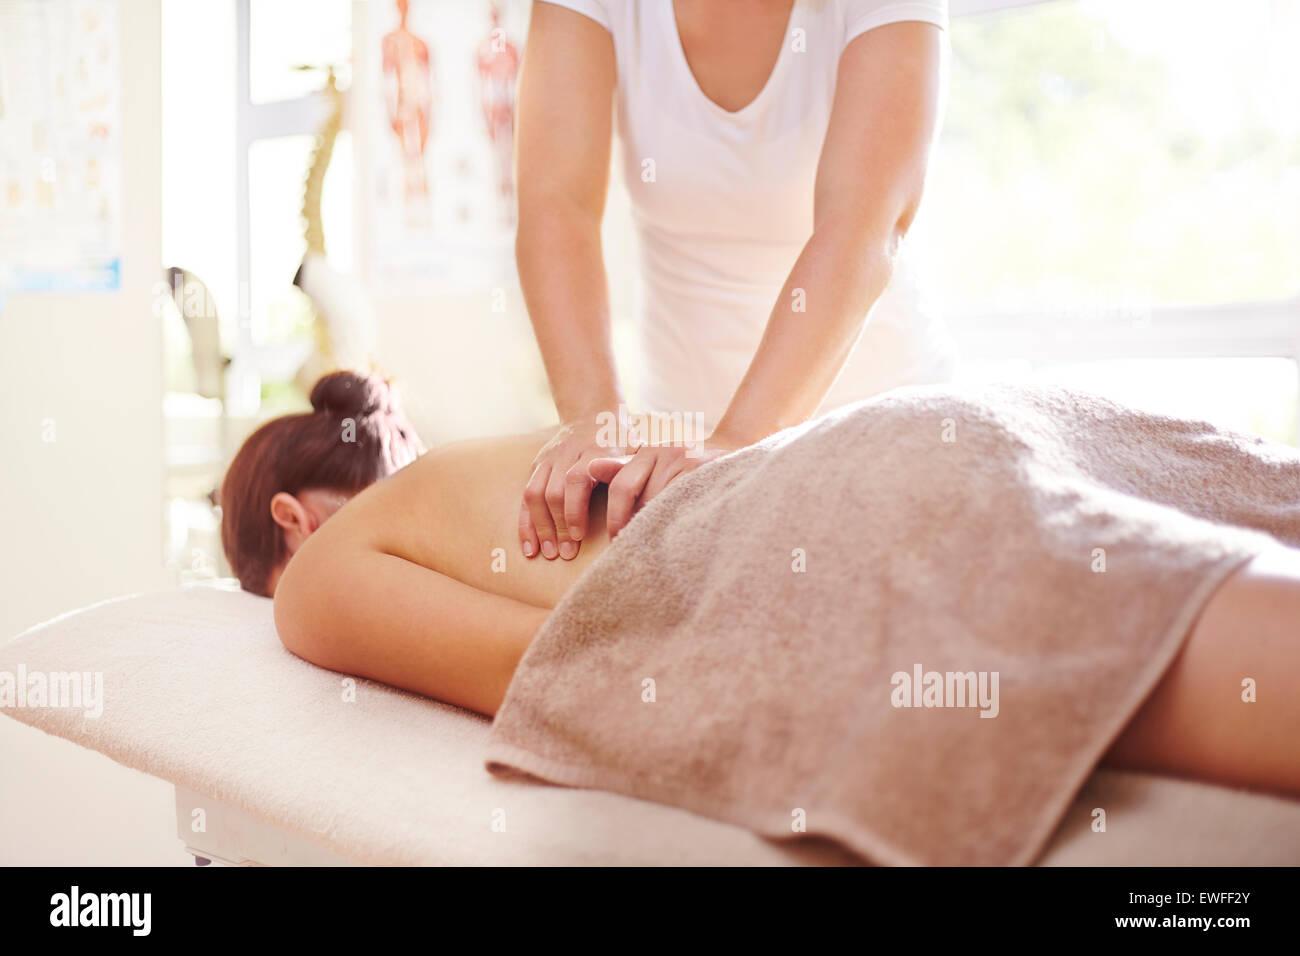 Frau empfangende Massage Masseurin Stockbild